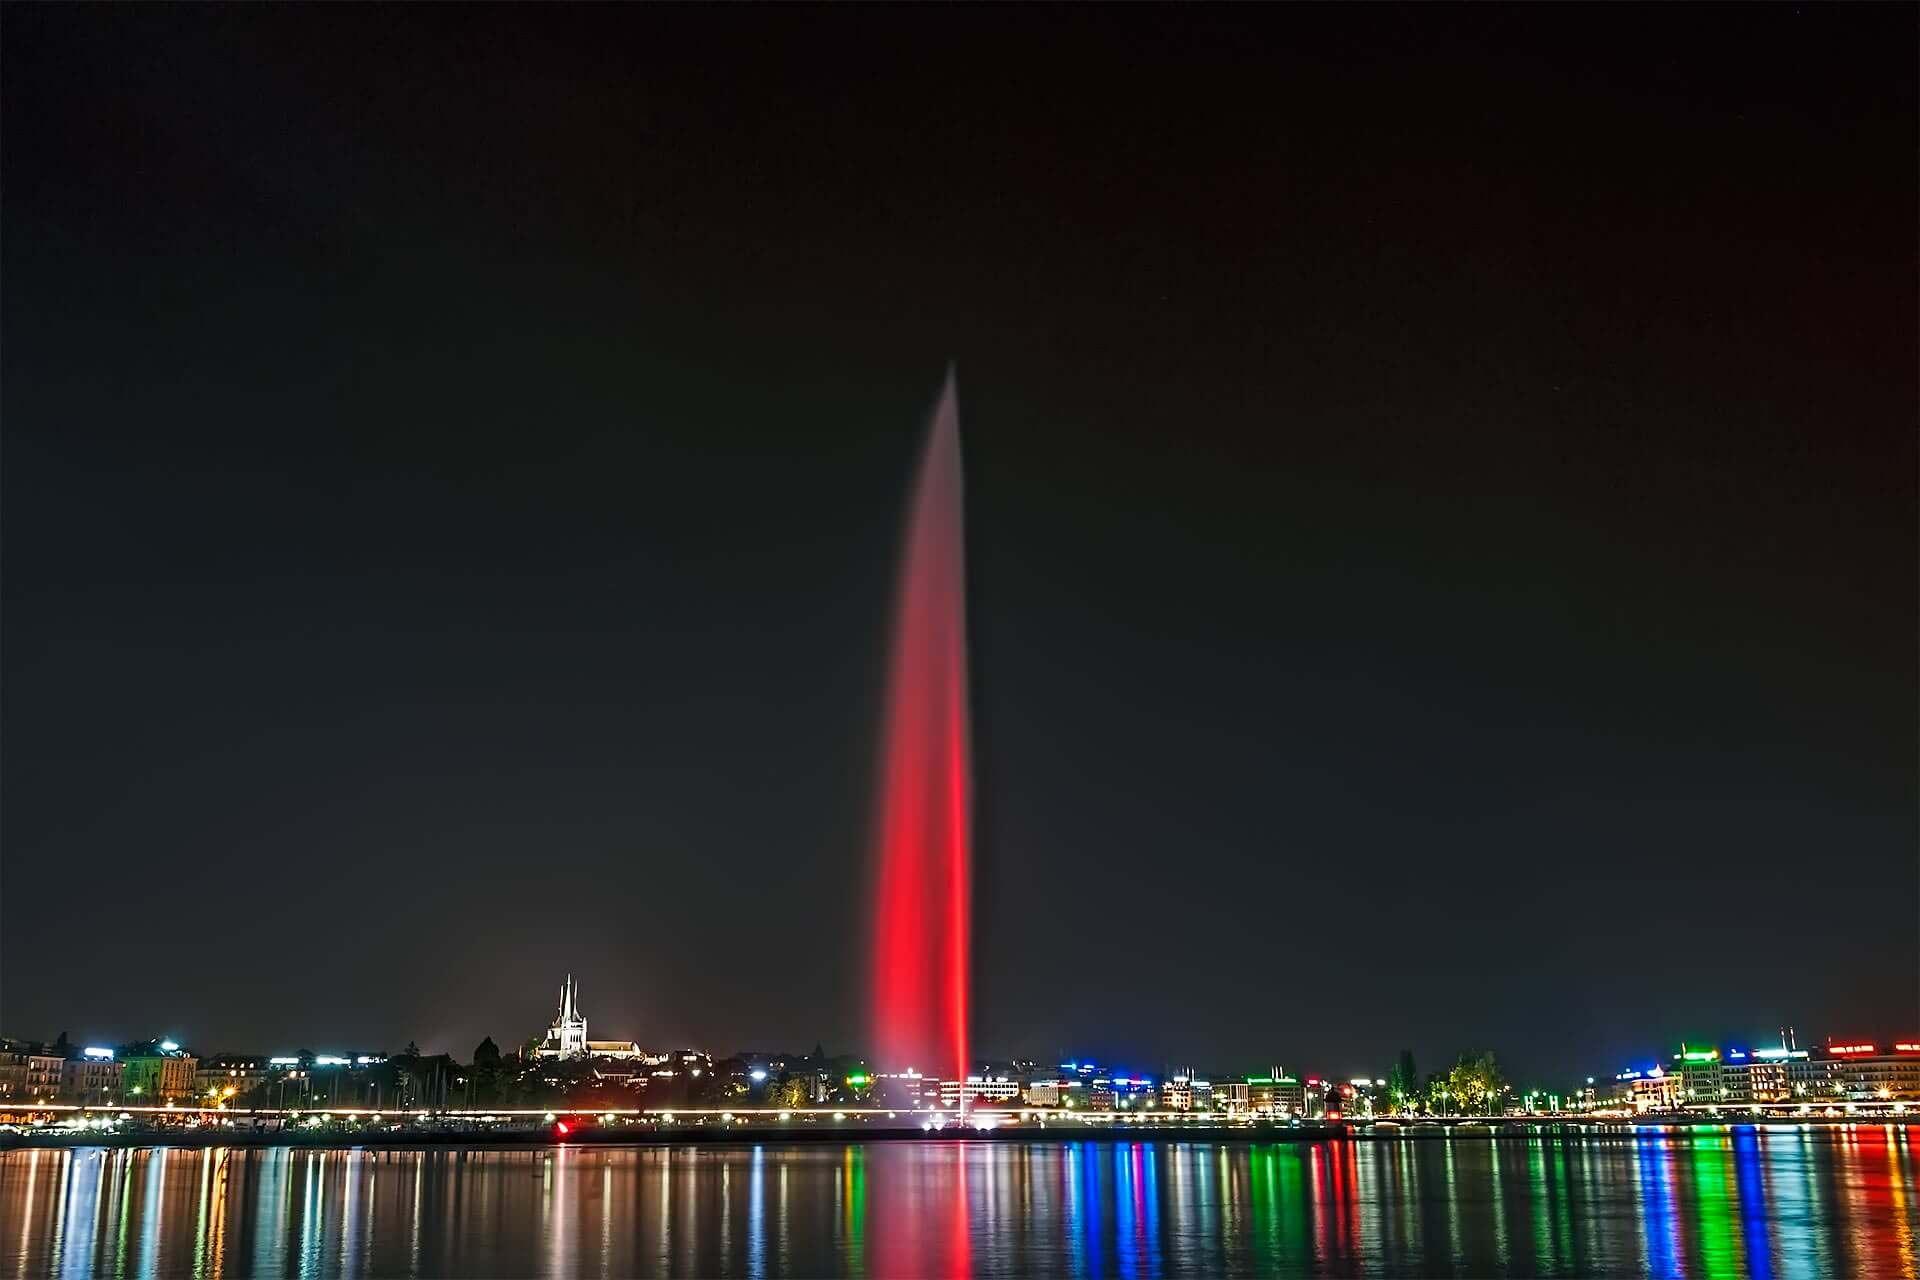 Genève by night © dvdesign.com